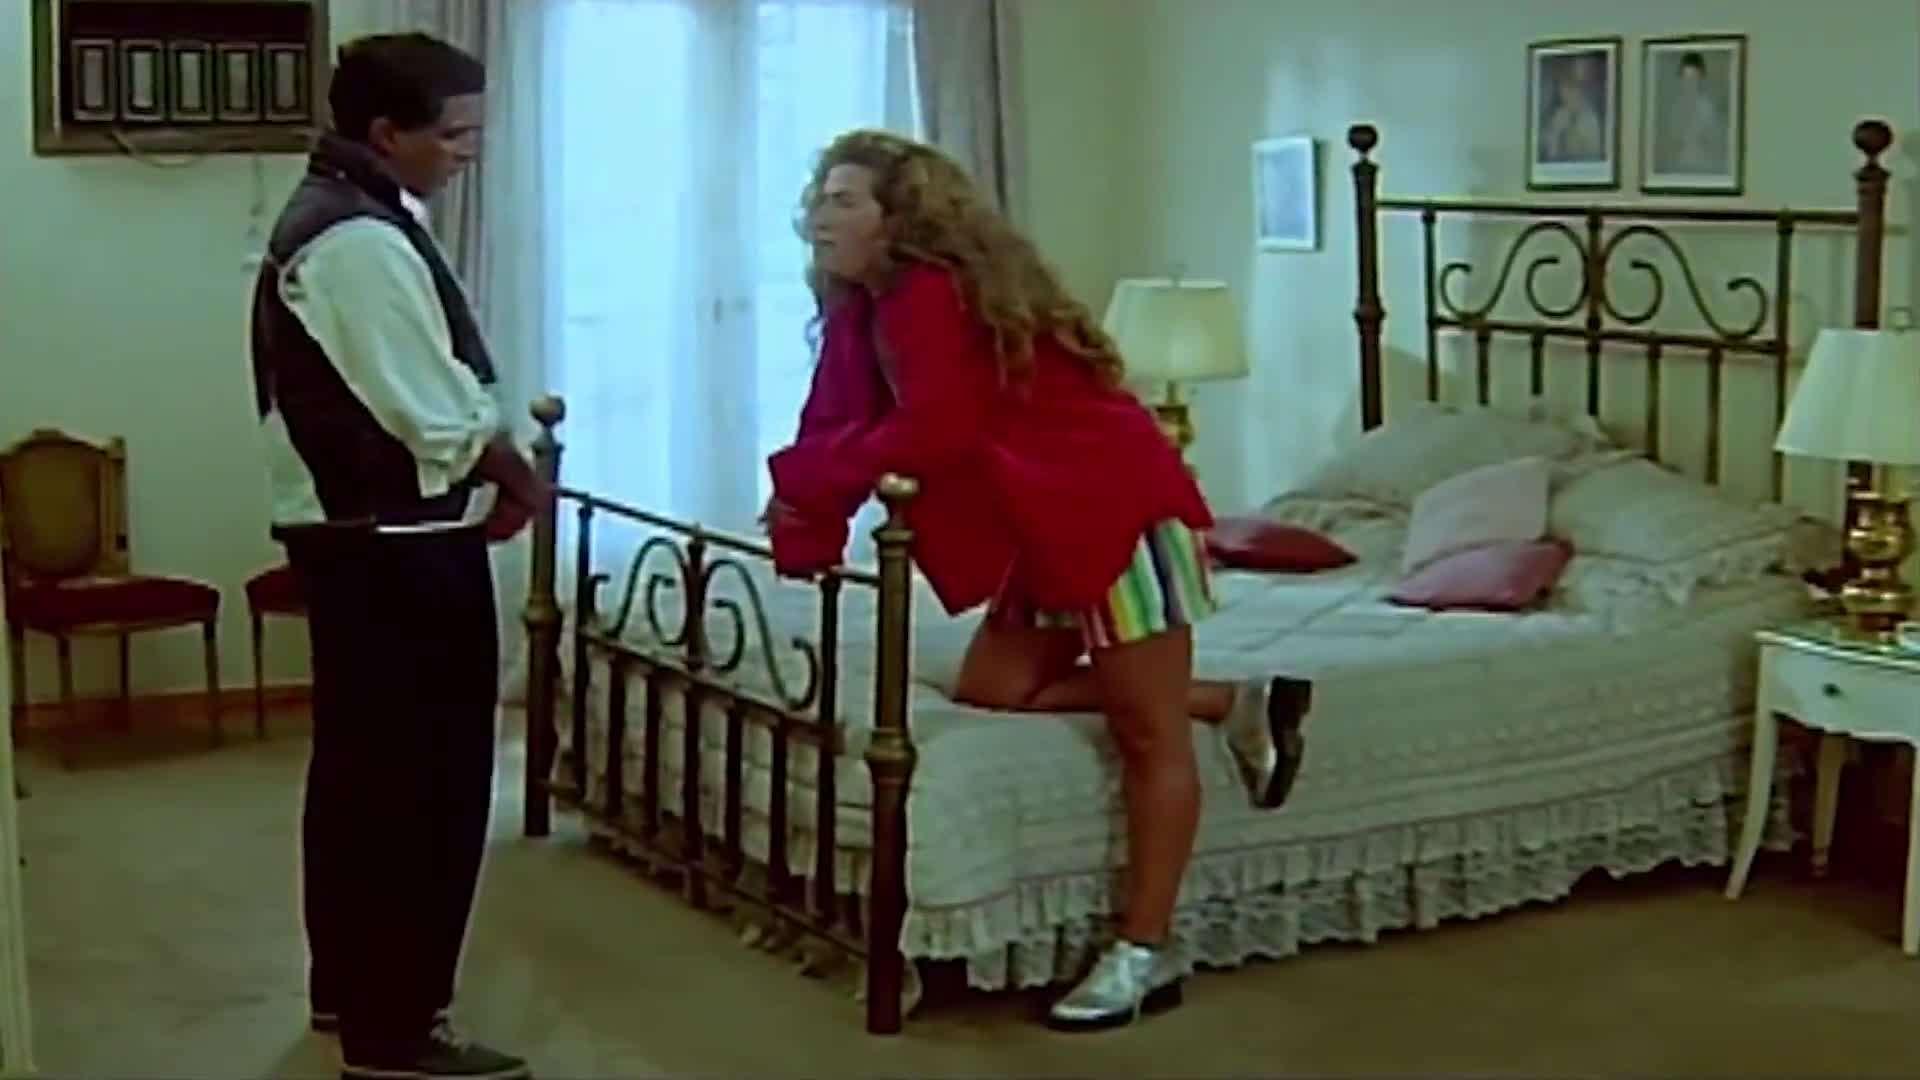 [فيلم][تورنت][تحميل][استاكوزا][1996][1080p][Web-DL] 8 arabp2p.com